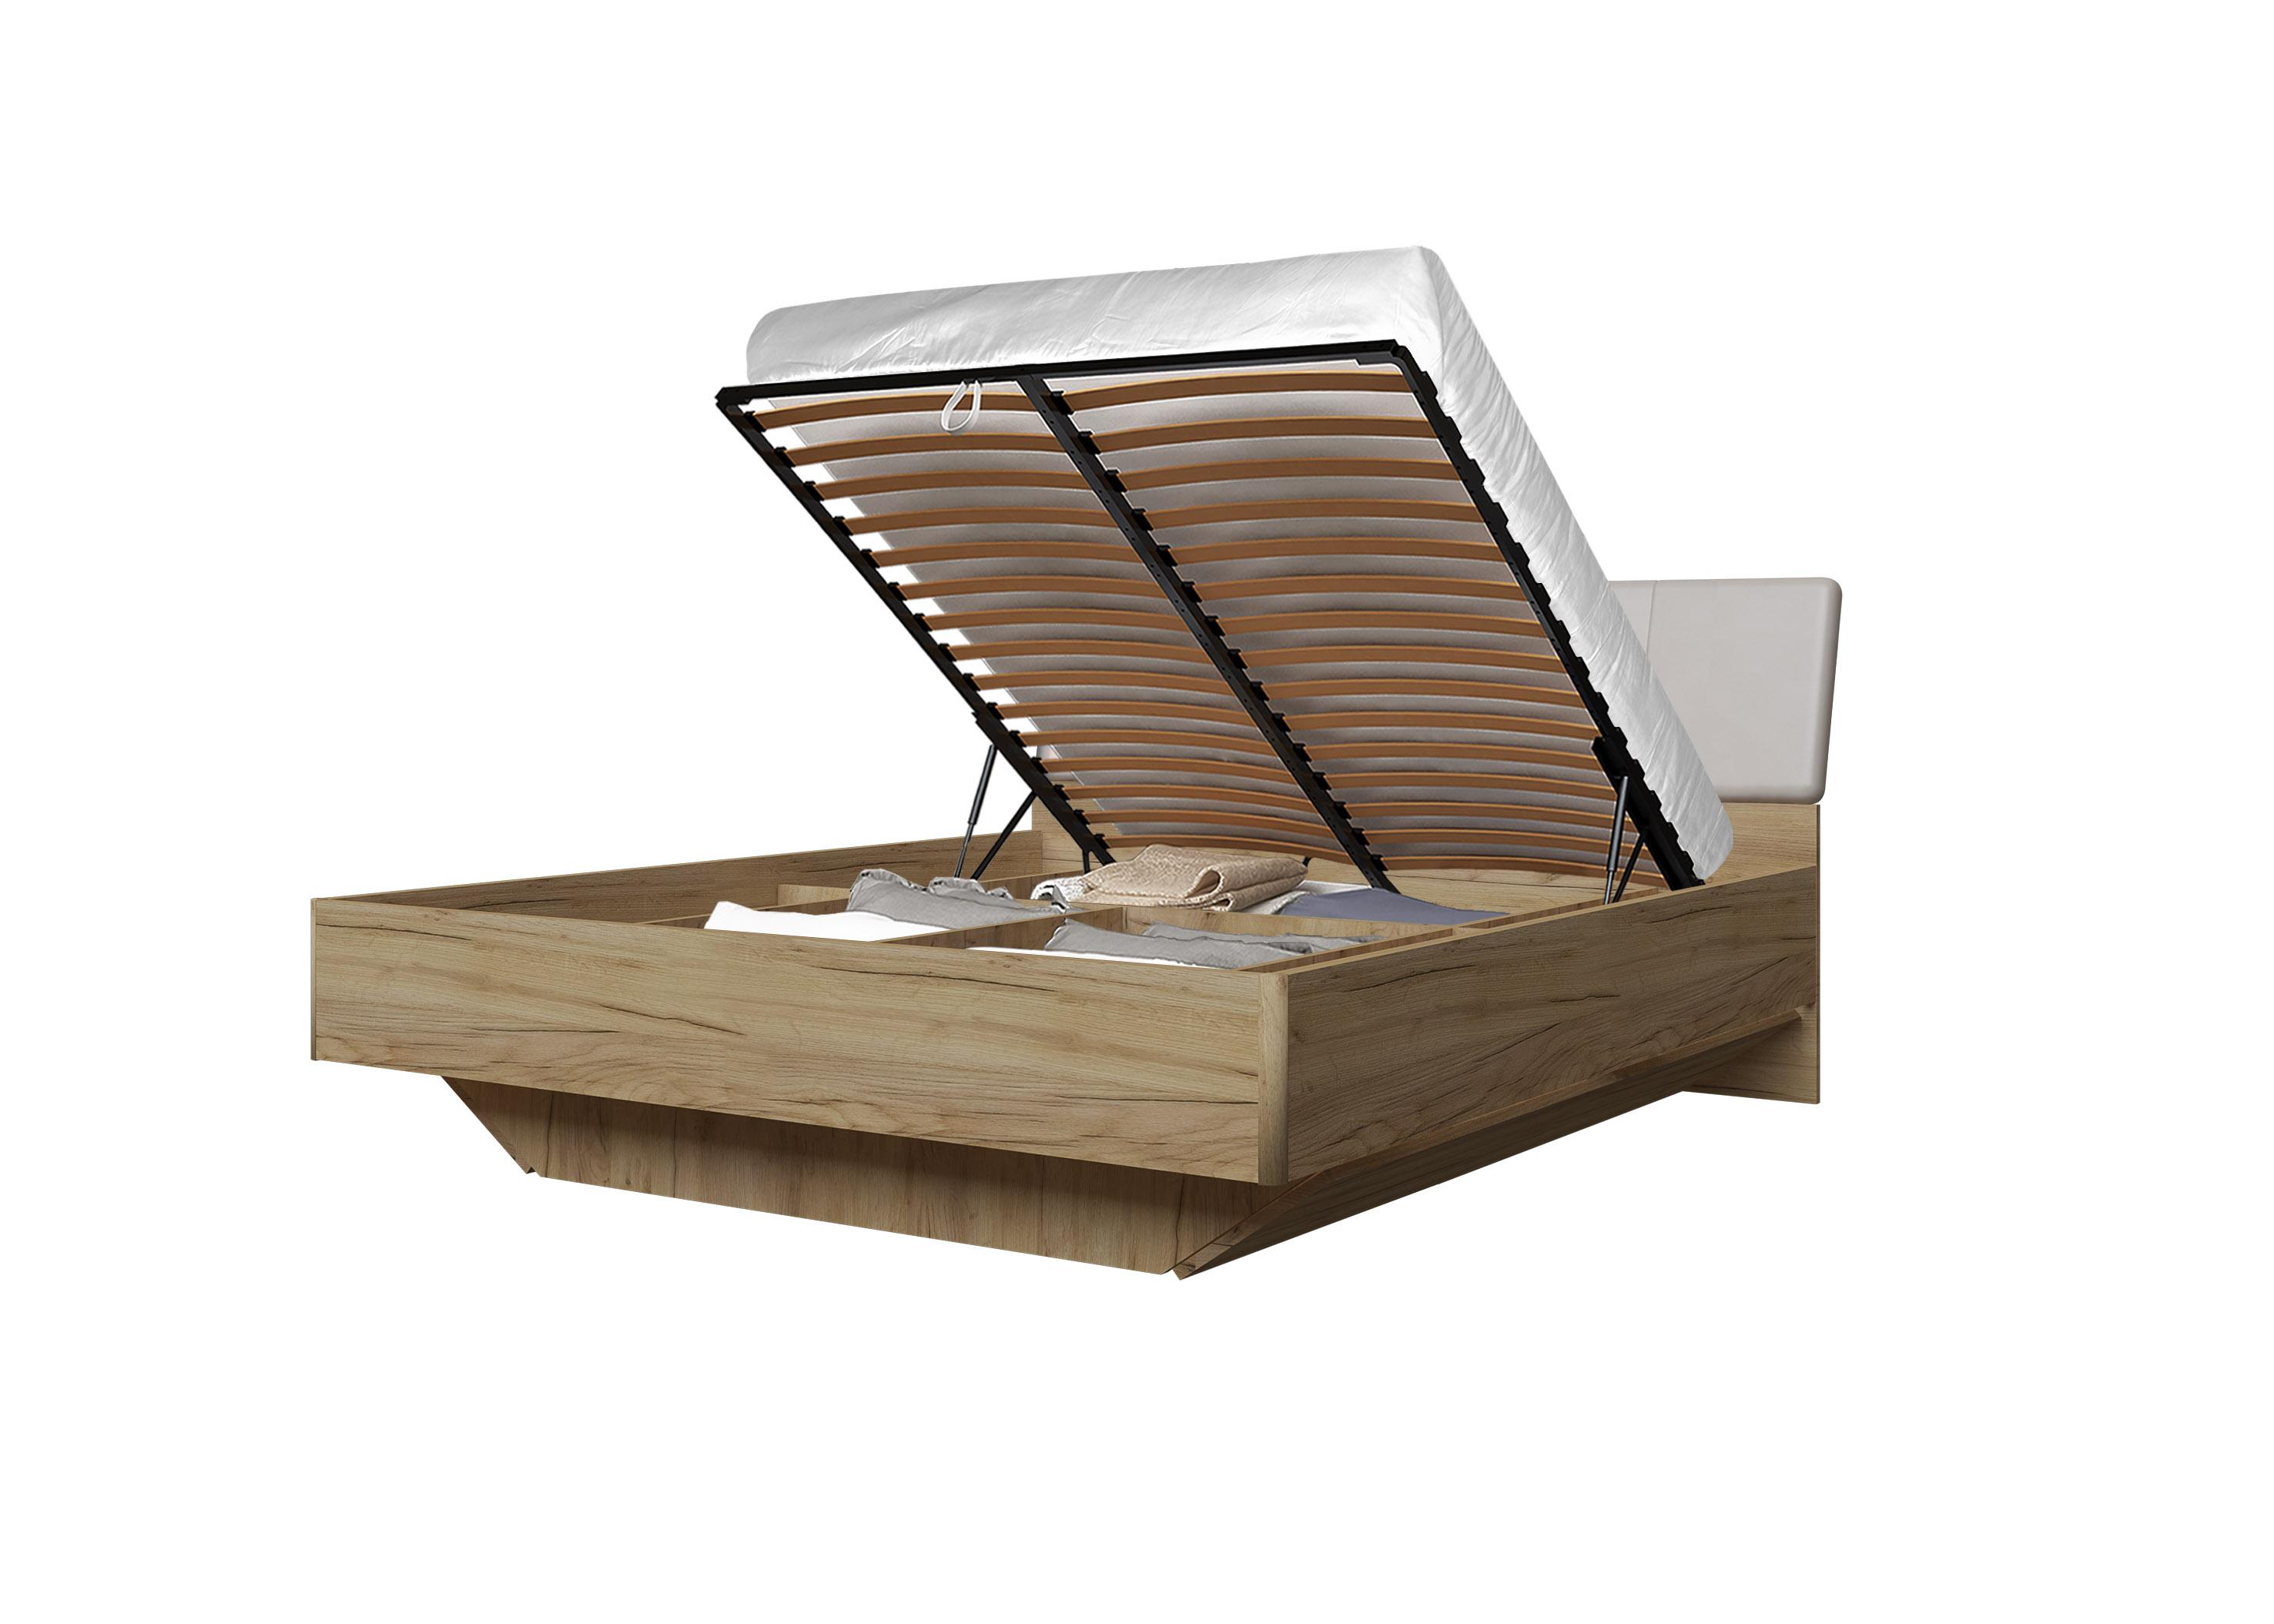 Doppelbett Toskana 180x200 in Eiche/Cappuccino inkl. Bettkasten